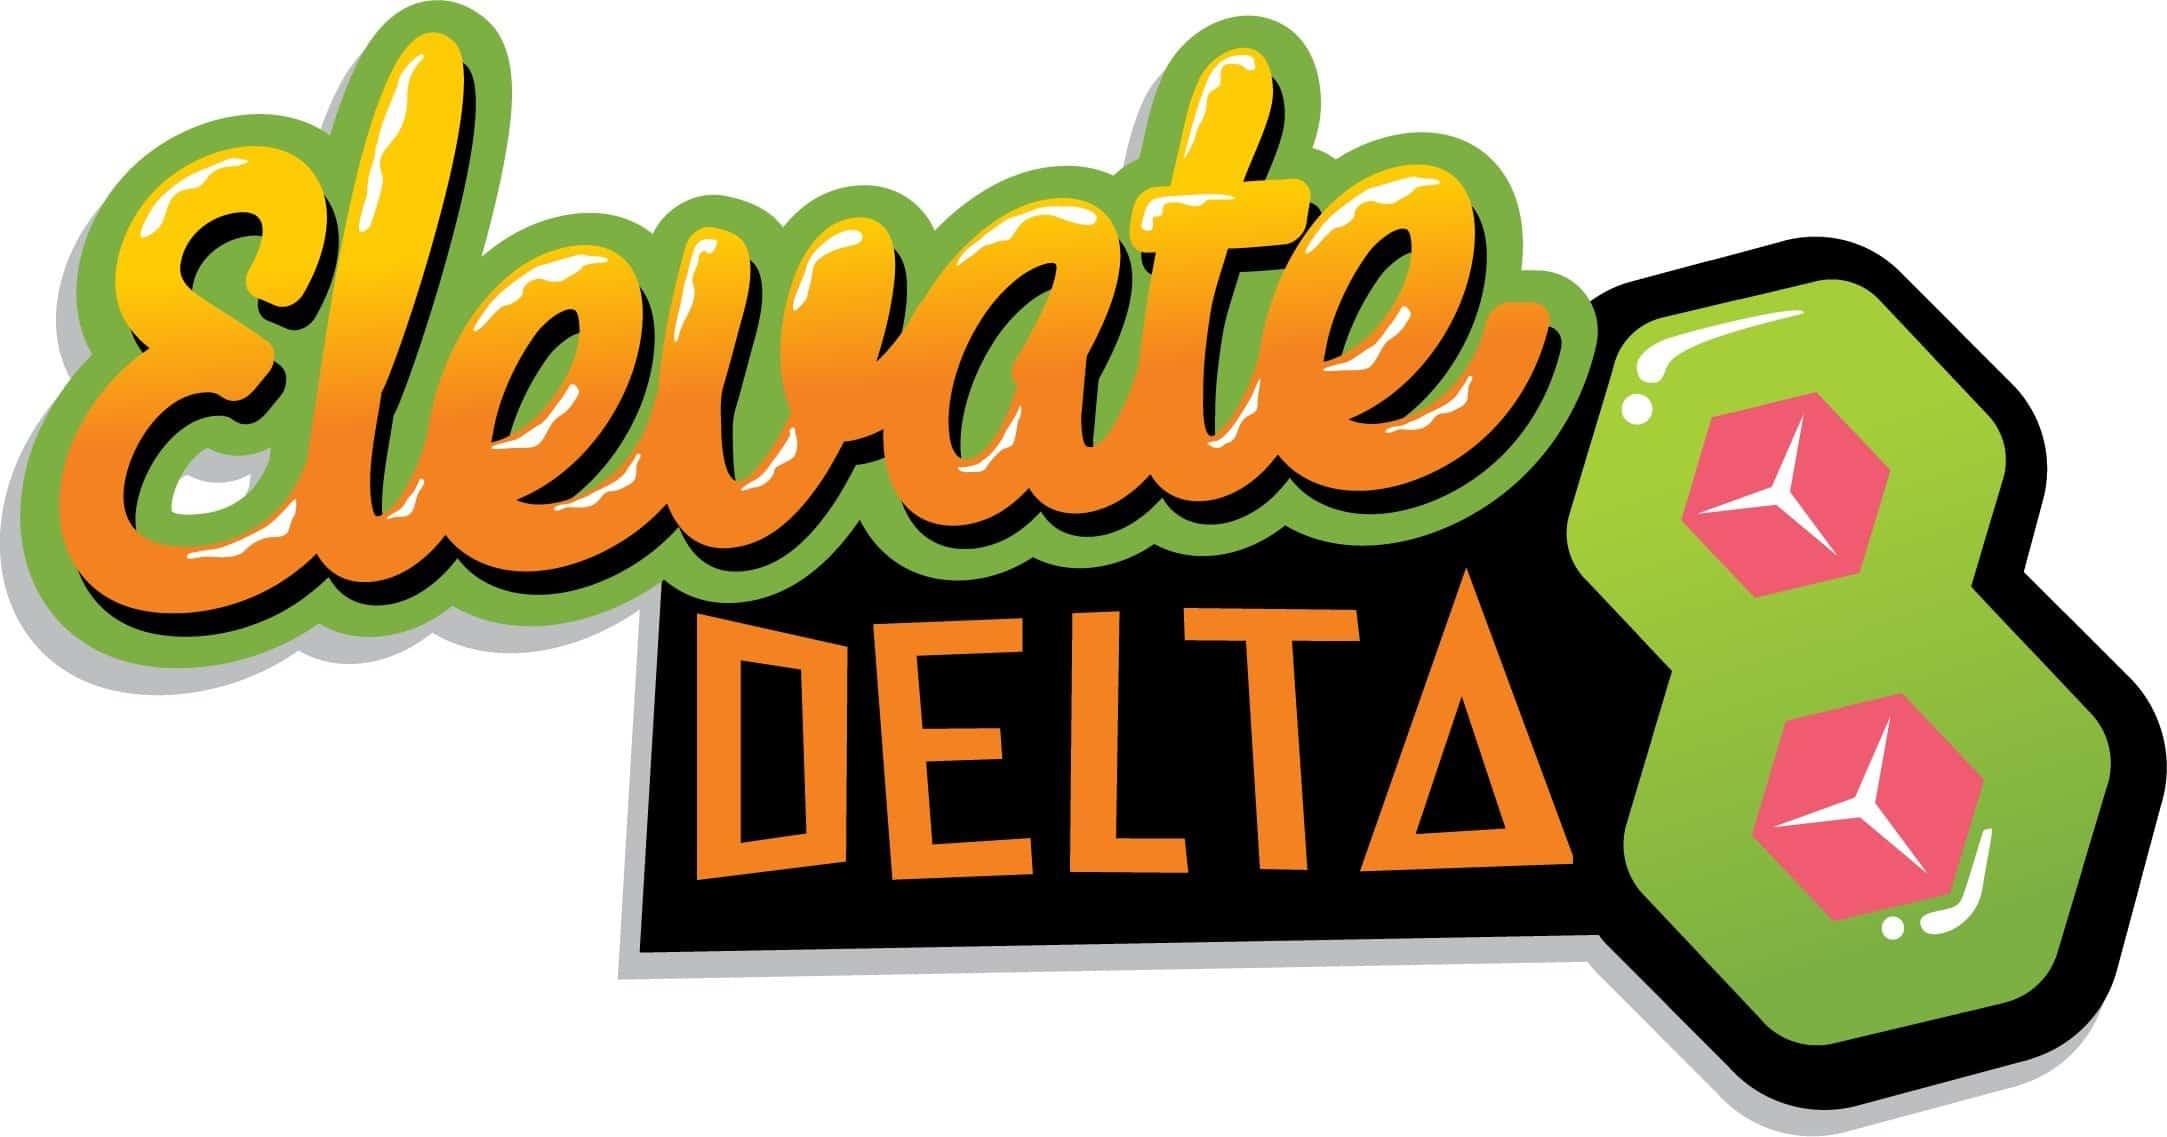 Elevate Delta 8 CBD Coupon Code Logo